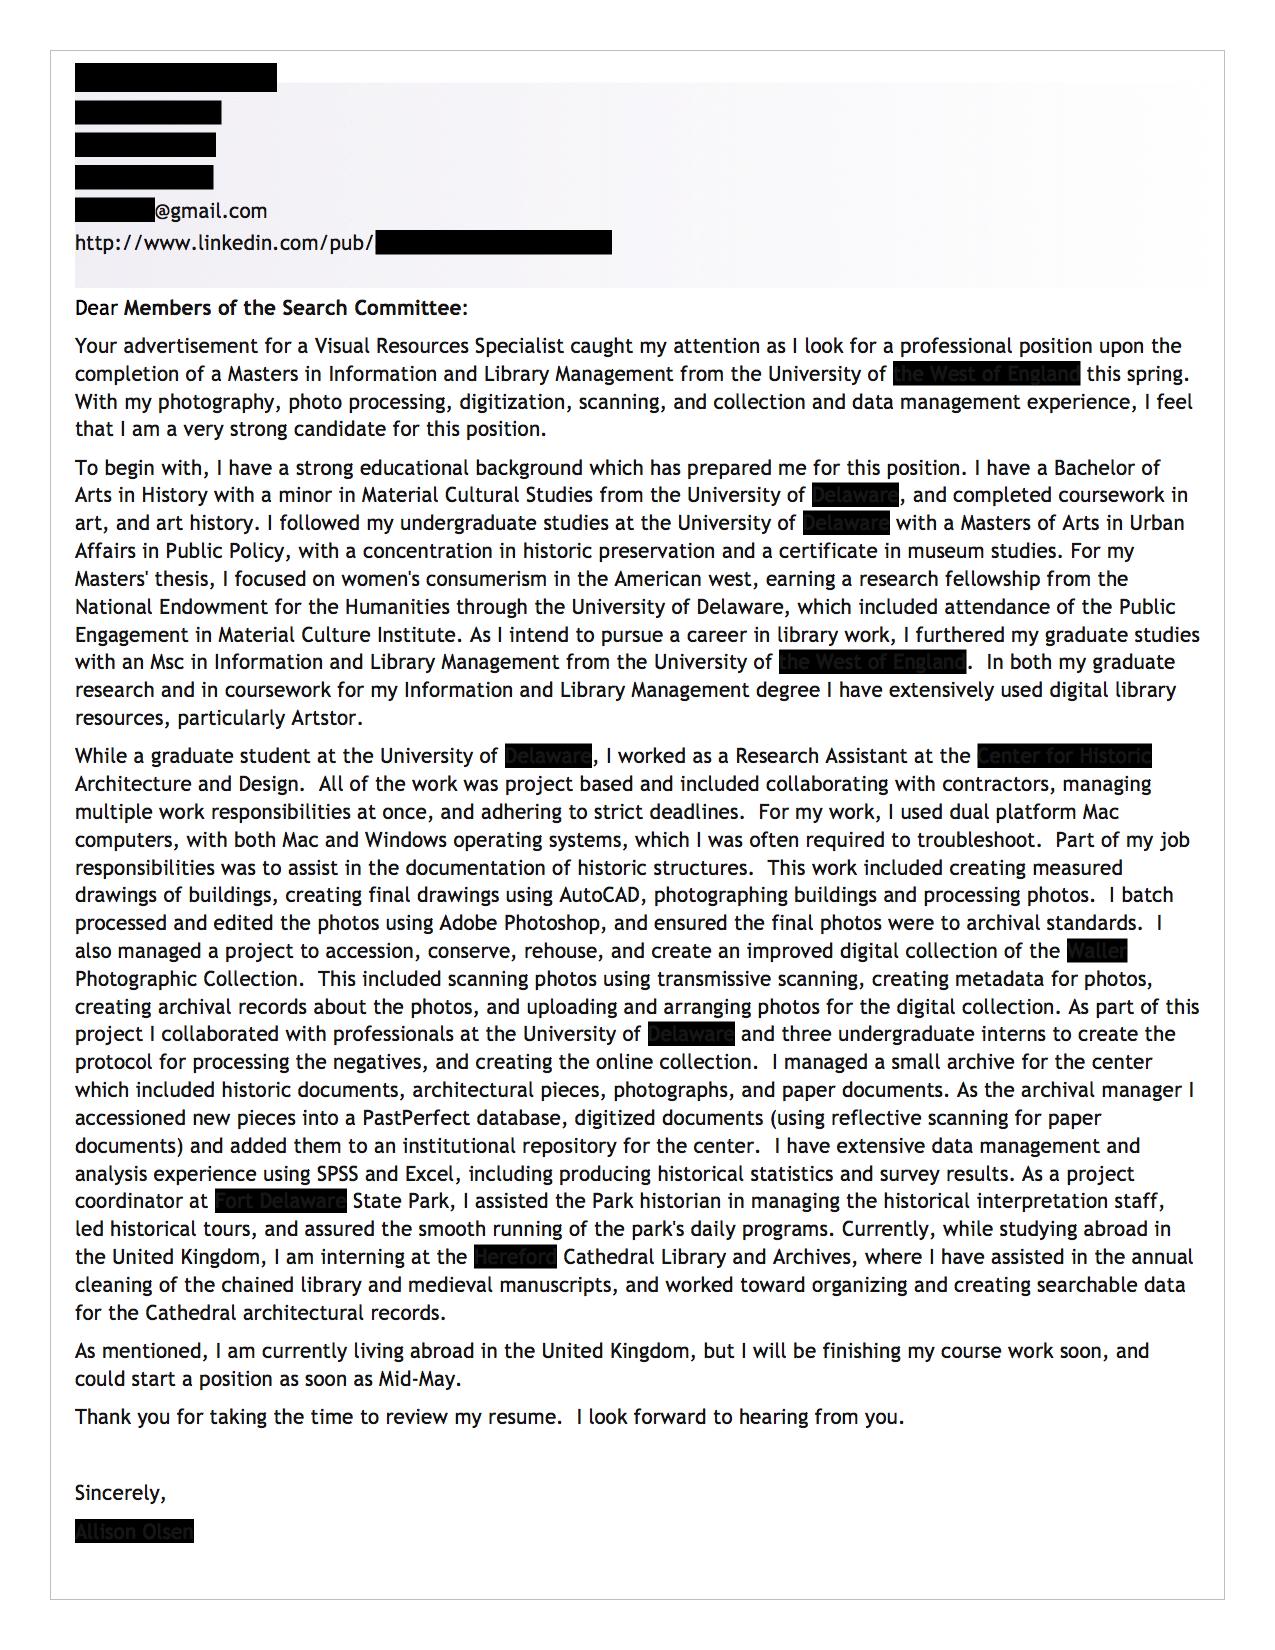 Public Librarian Cover Letter 30.04.2017